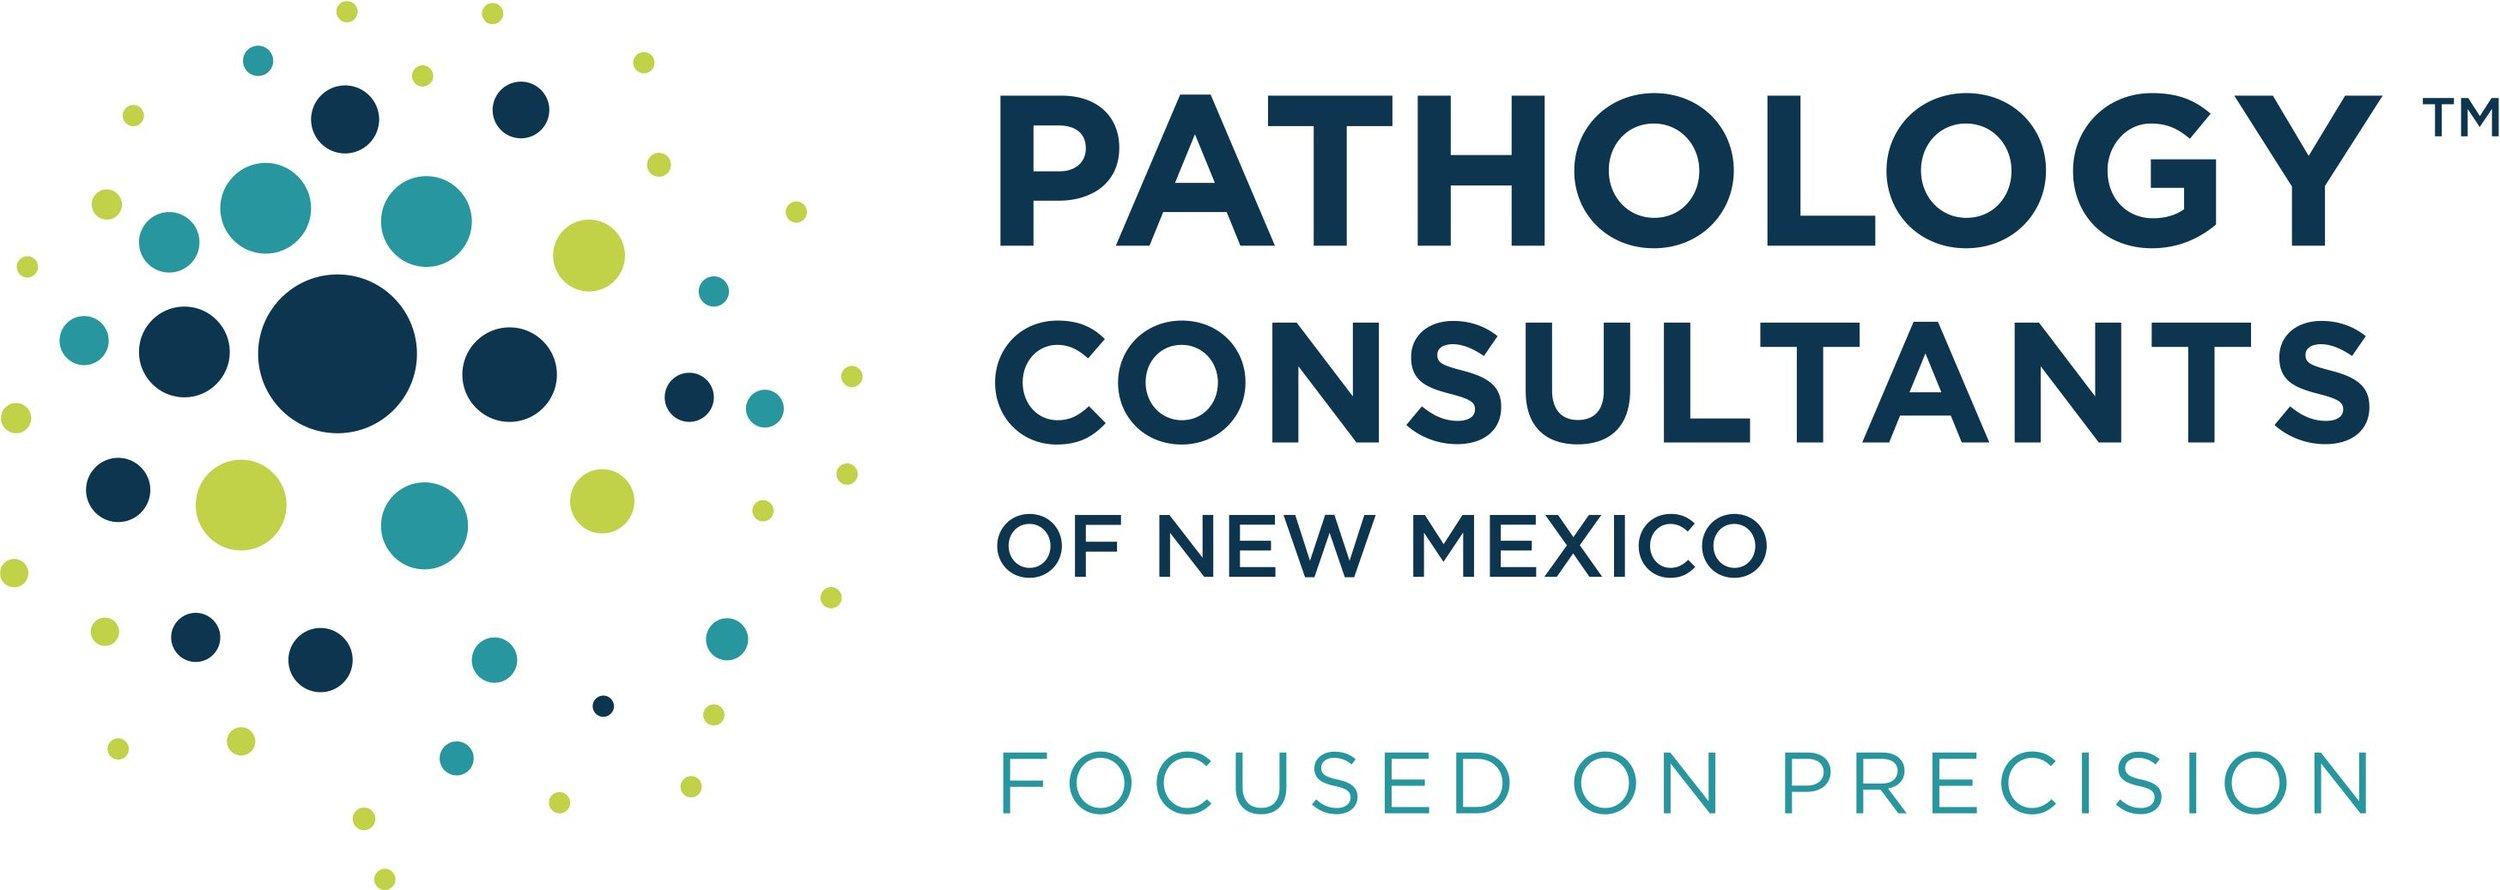 Pathology Consultants of New Mexico Logo.jpg